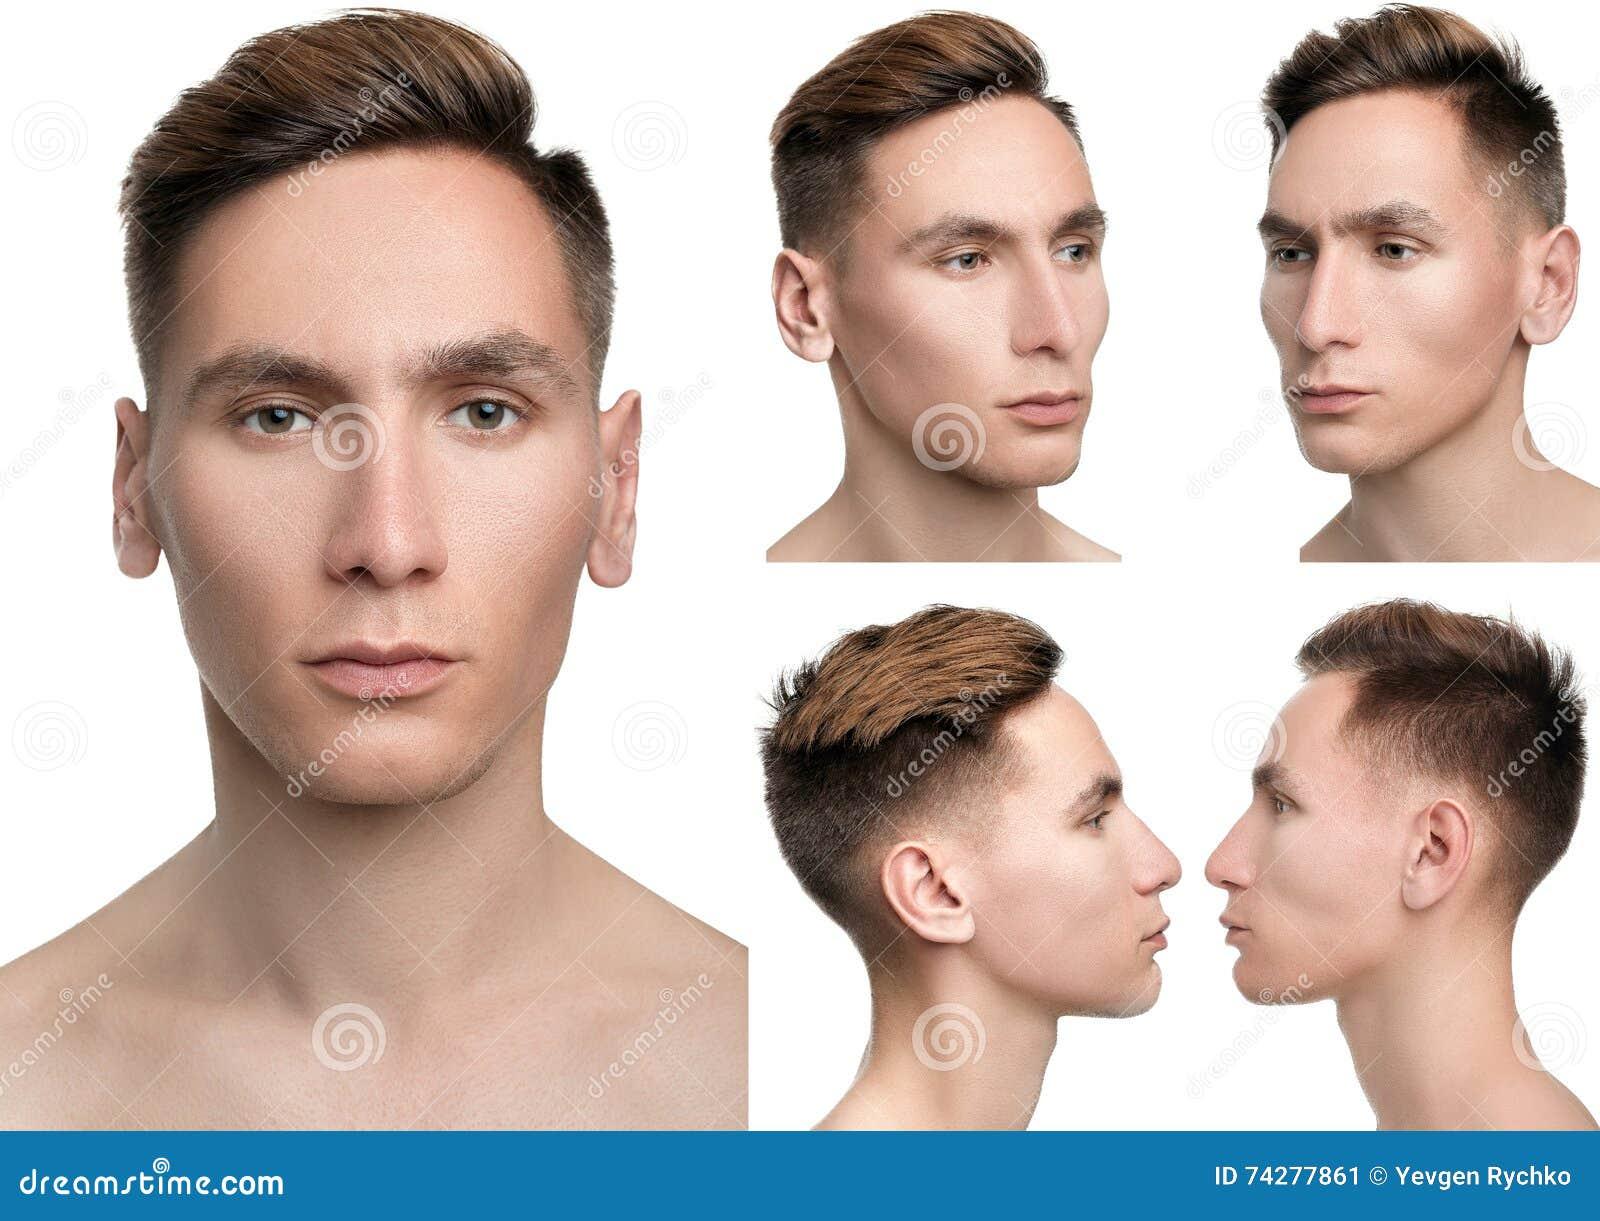 Five portrait facial angles photography